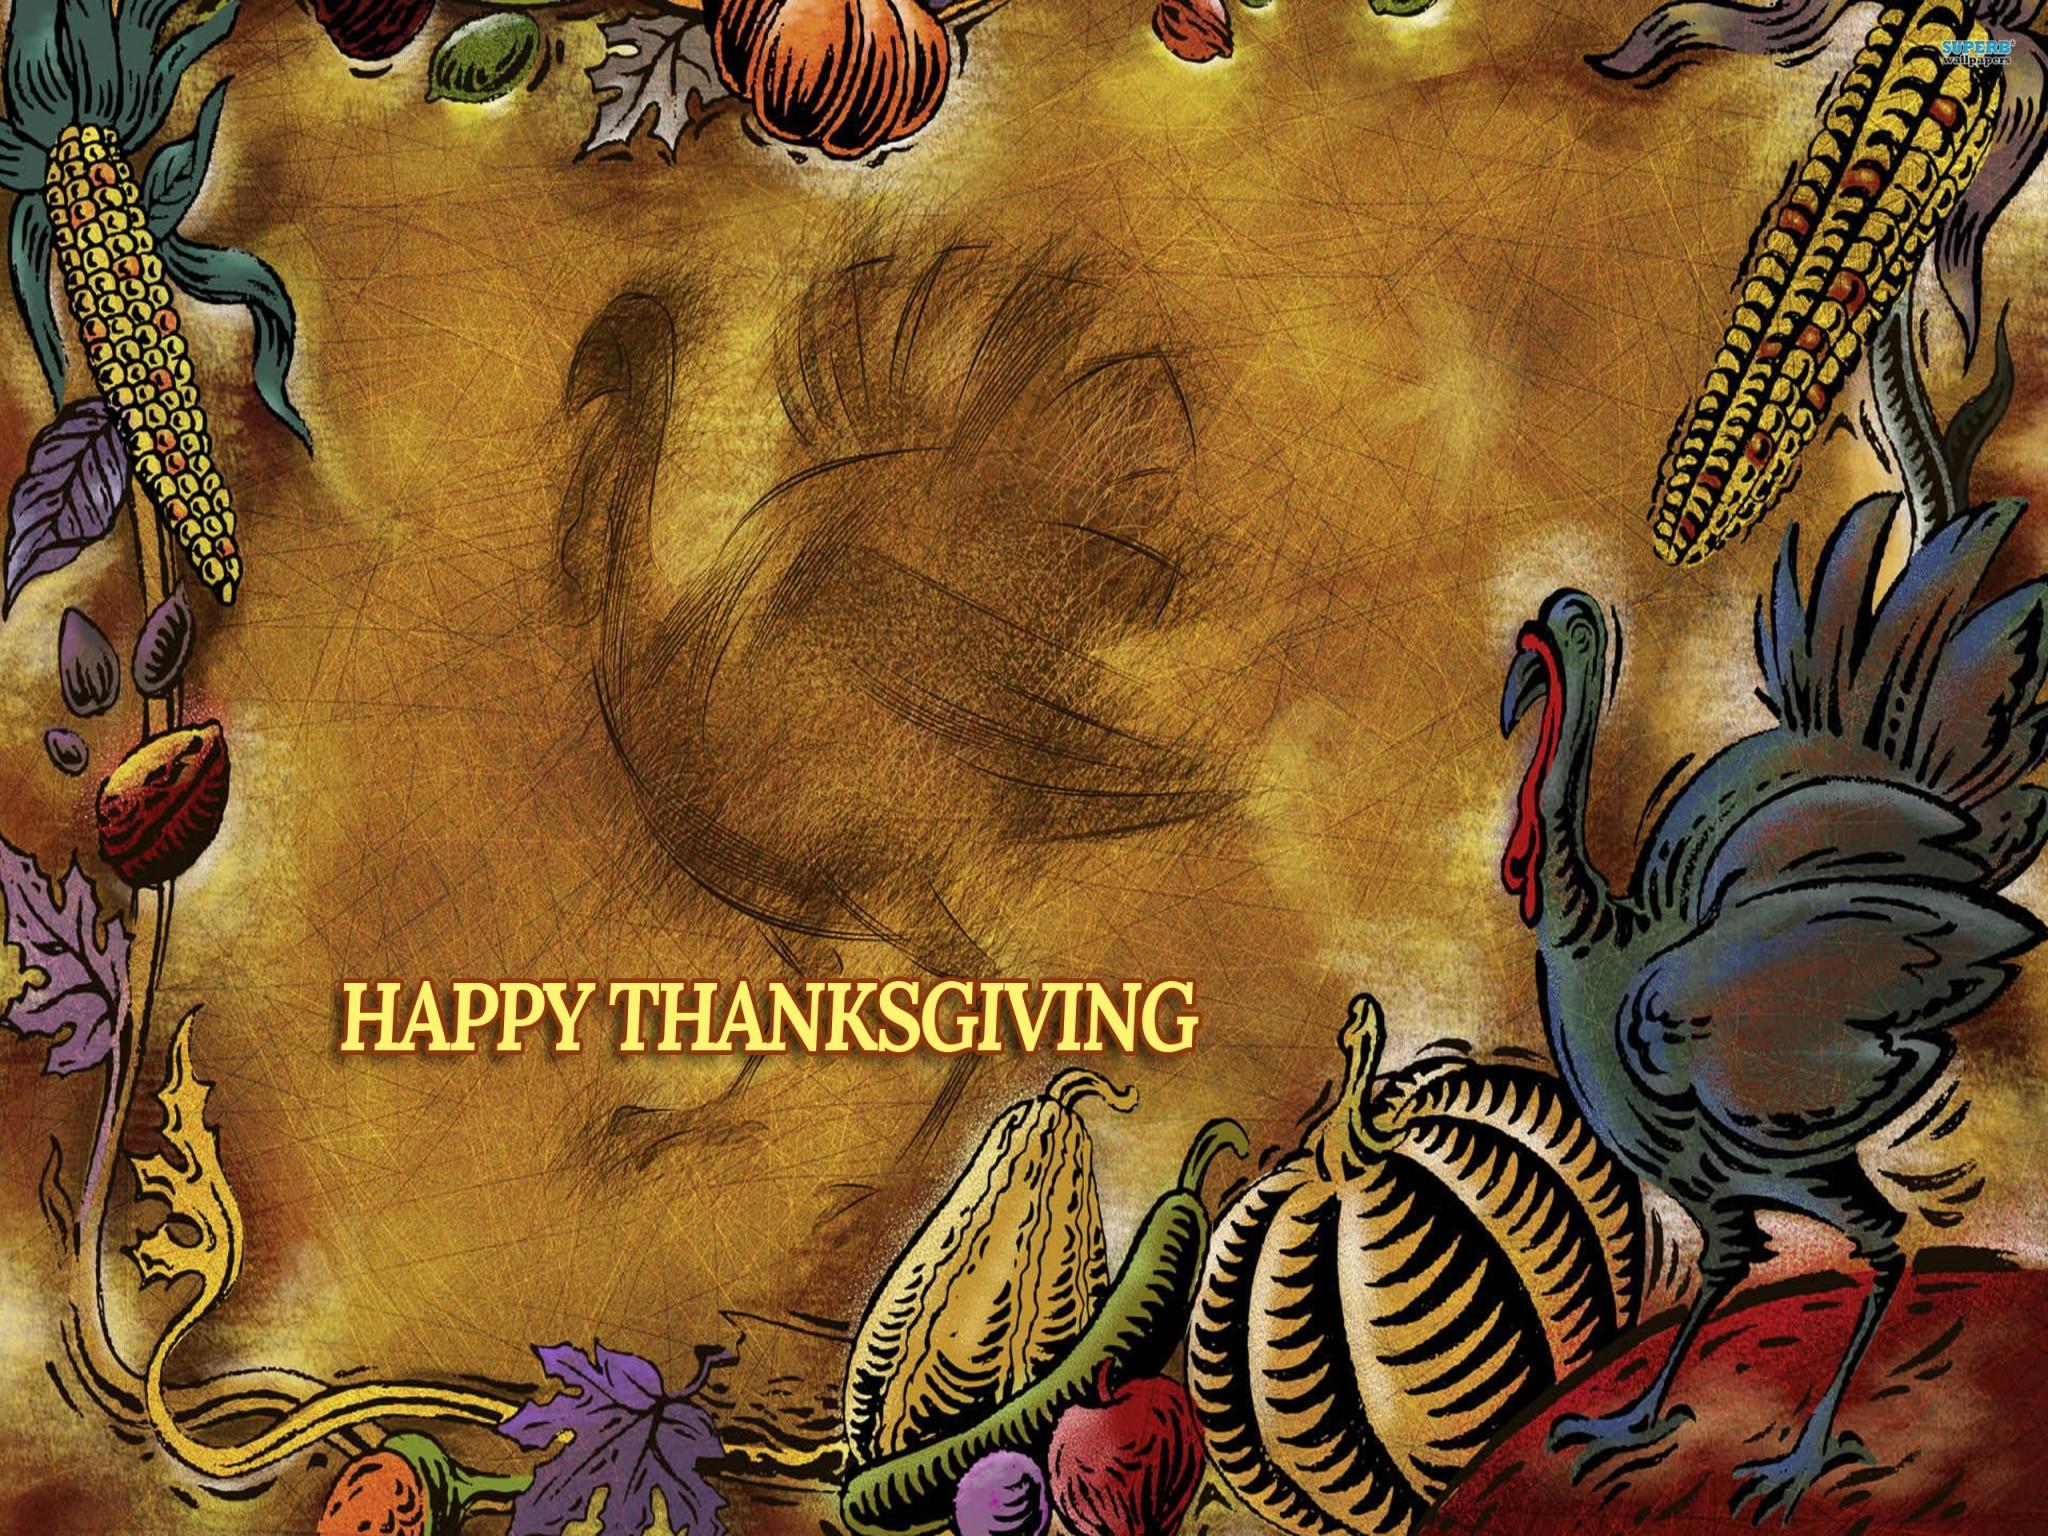 … hd thanksgiving wallpaper wallpapersafari …